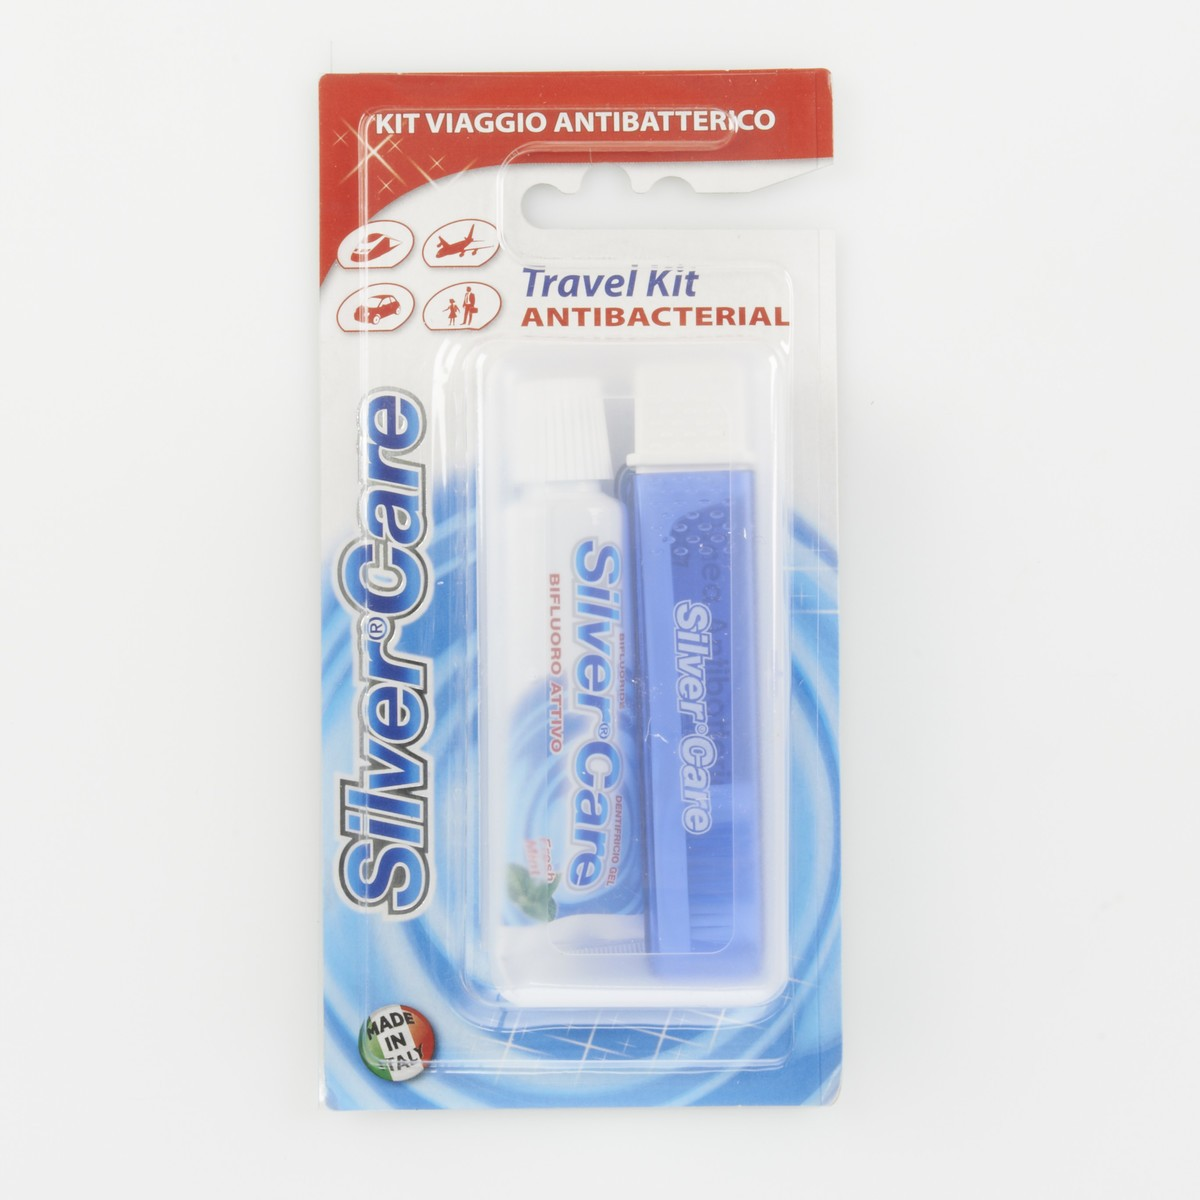 Silver Care Travel Kit Antibatterico